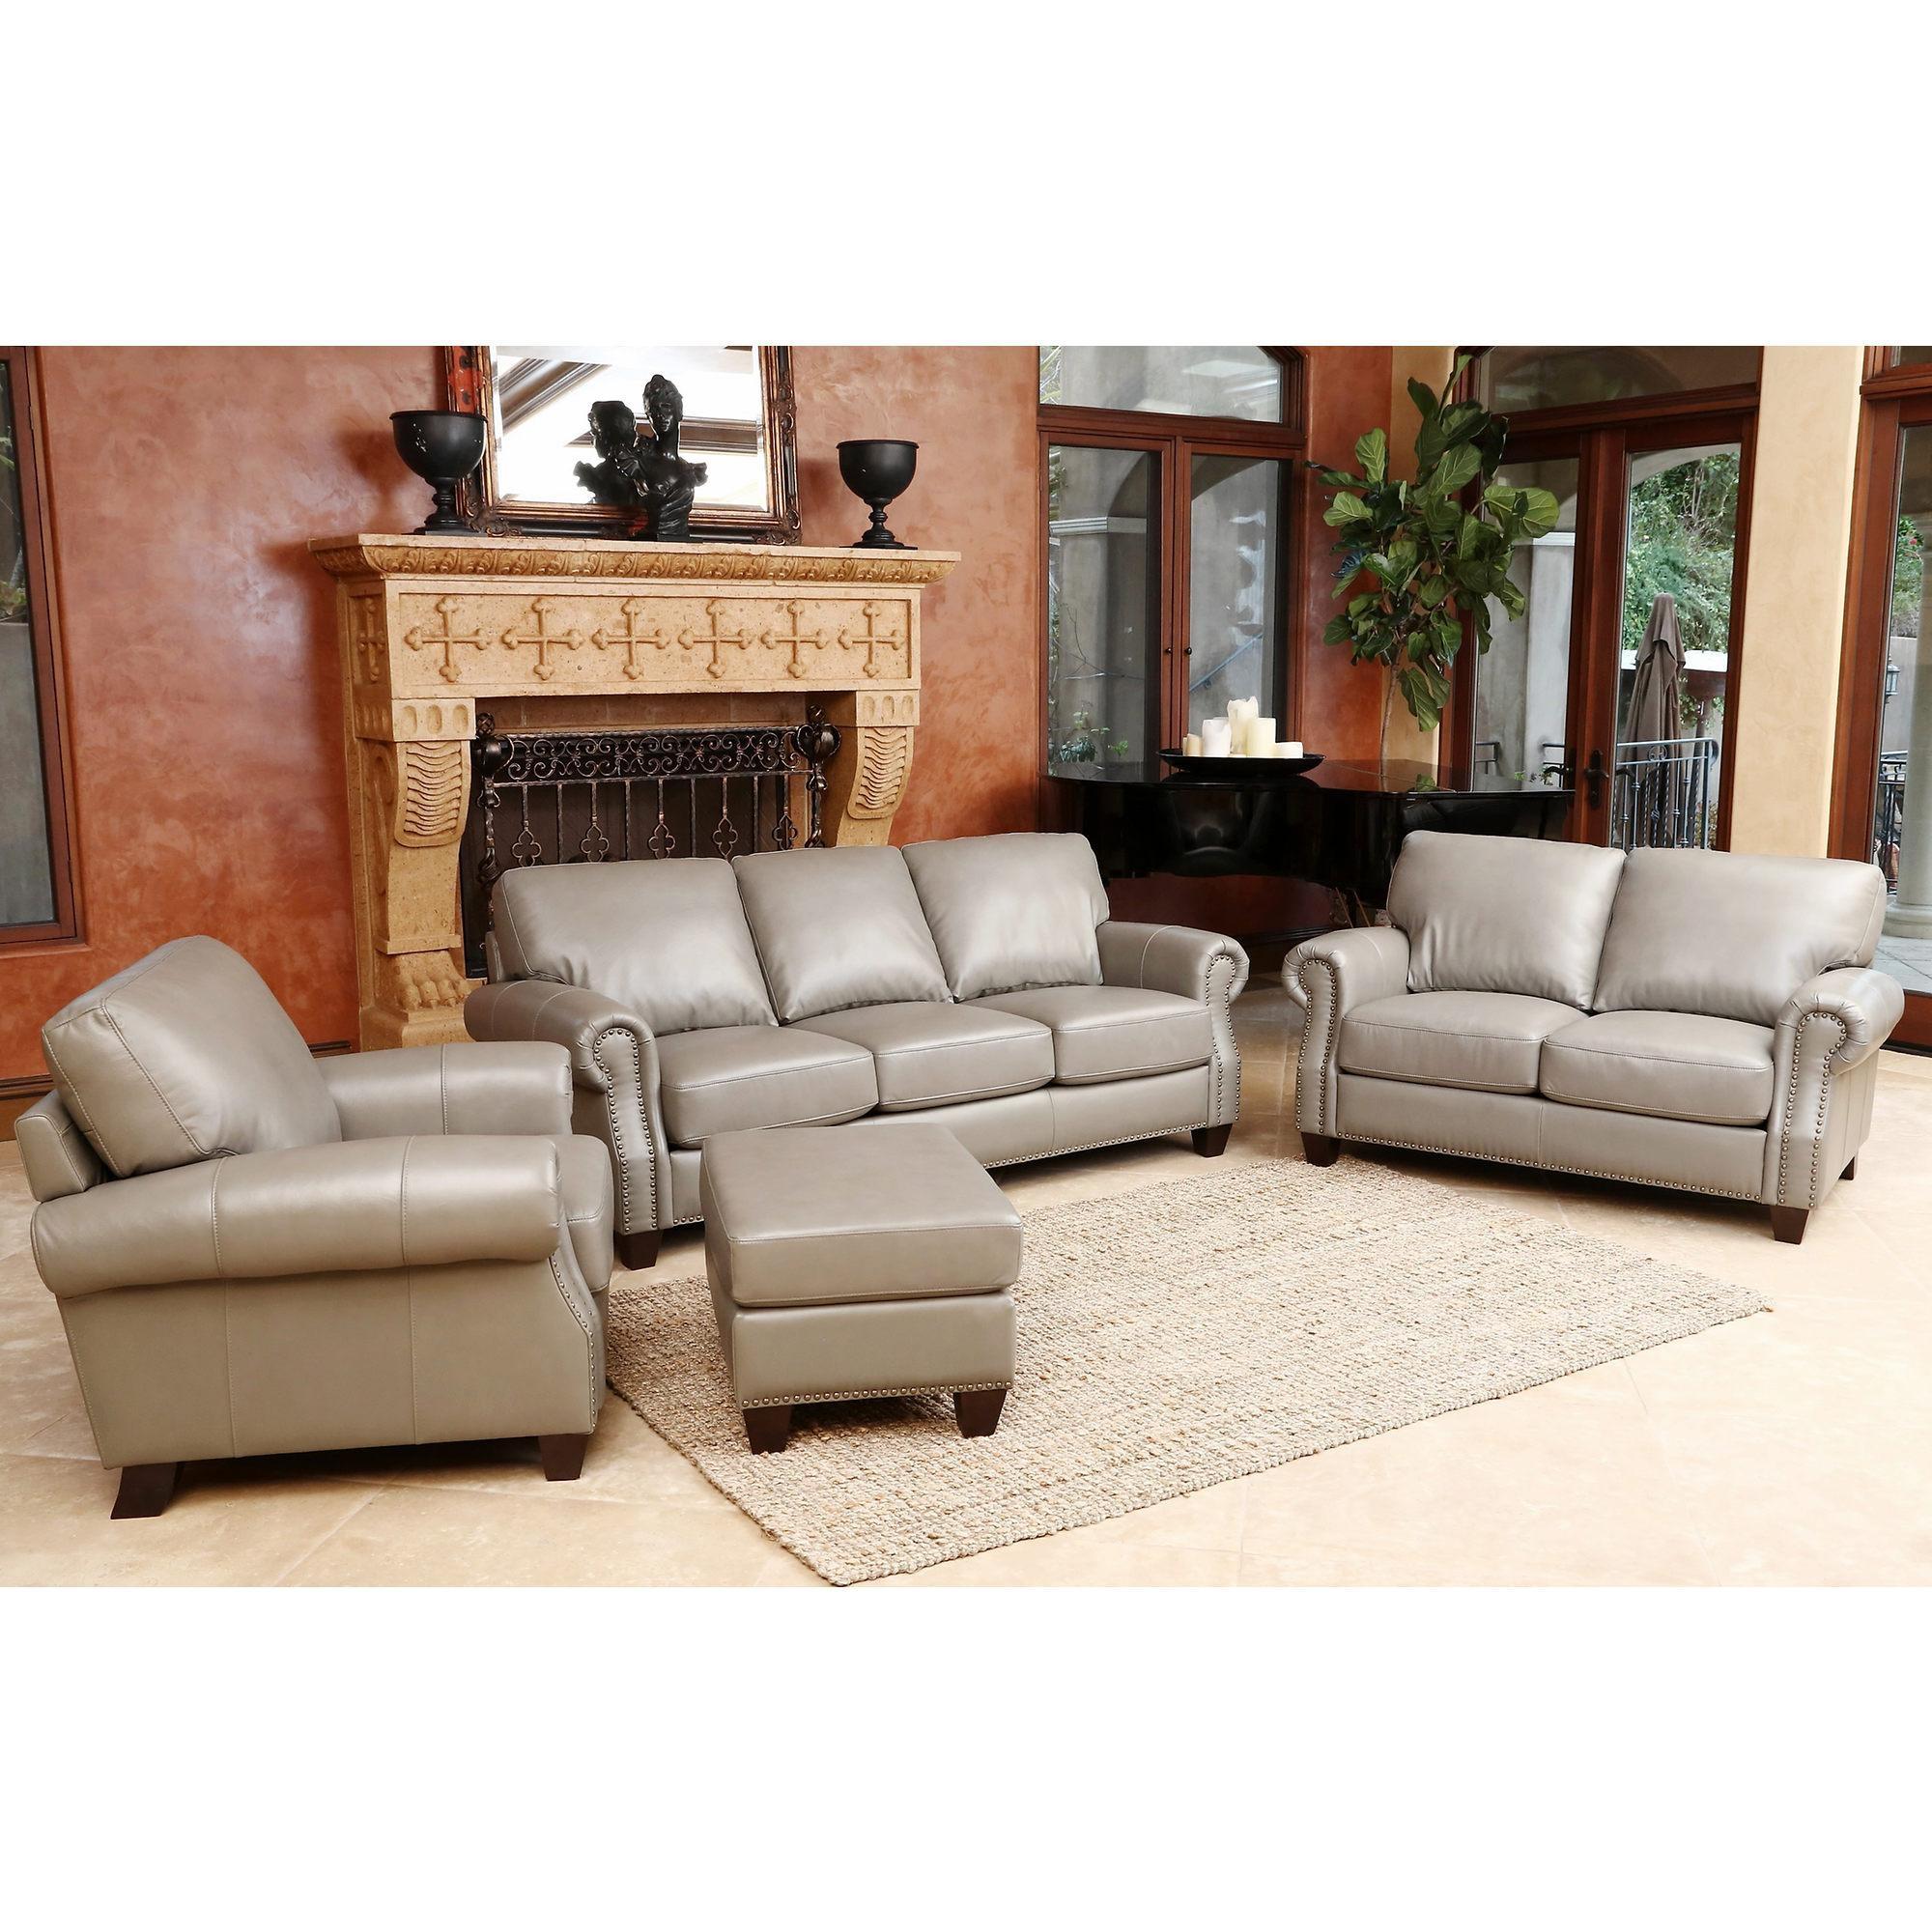 Abbyson Sofa Set | Sofas Decoration For Abbyson Sofas (Image 11 of 20)